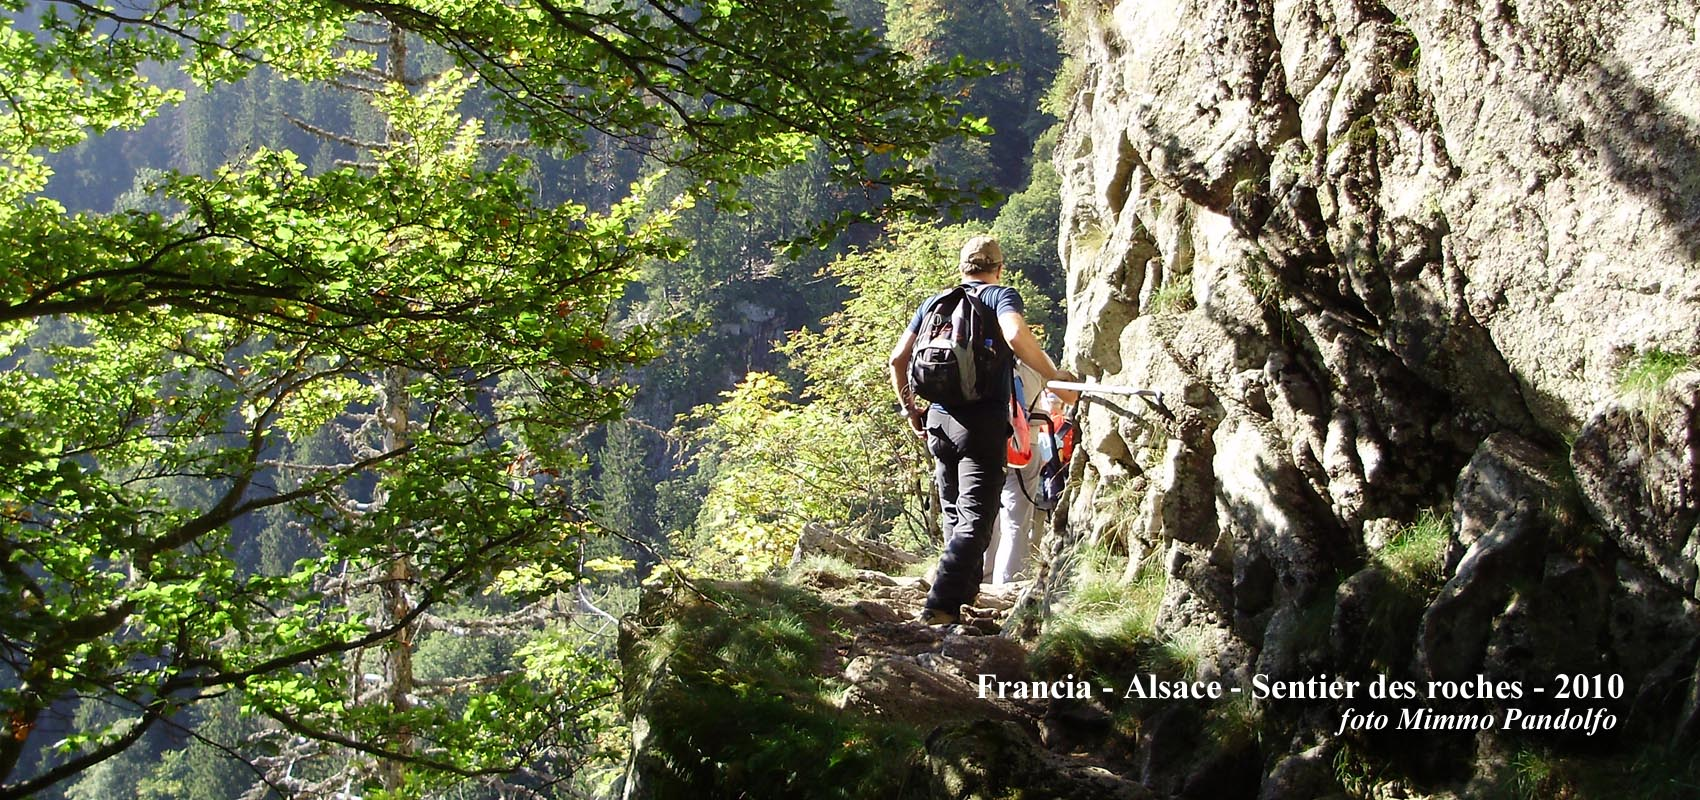 Francia, Alsace - Sentier des Roches - 2010